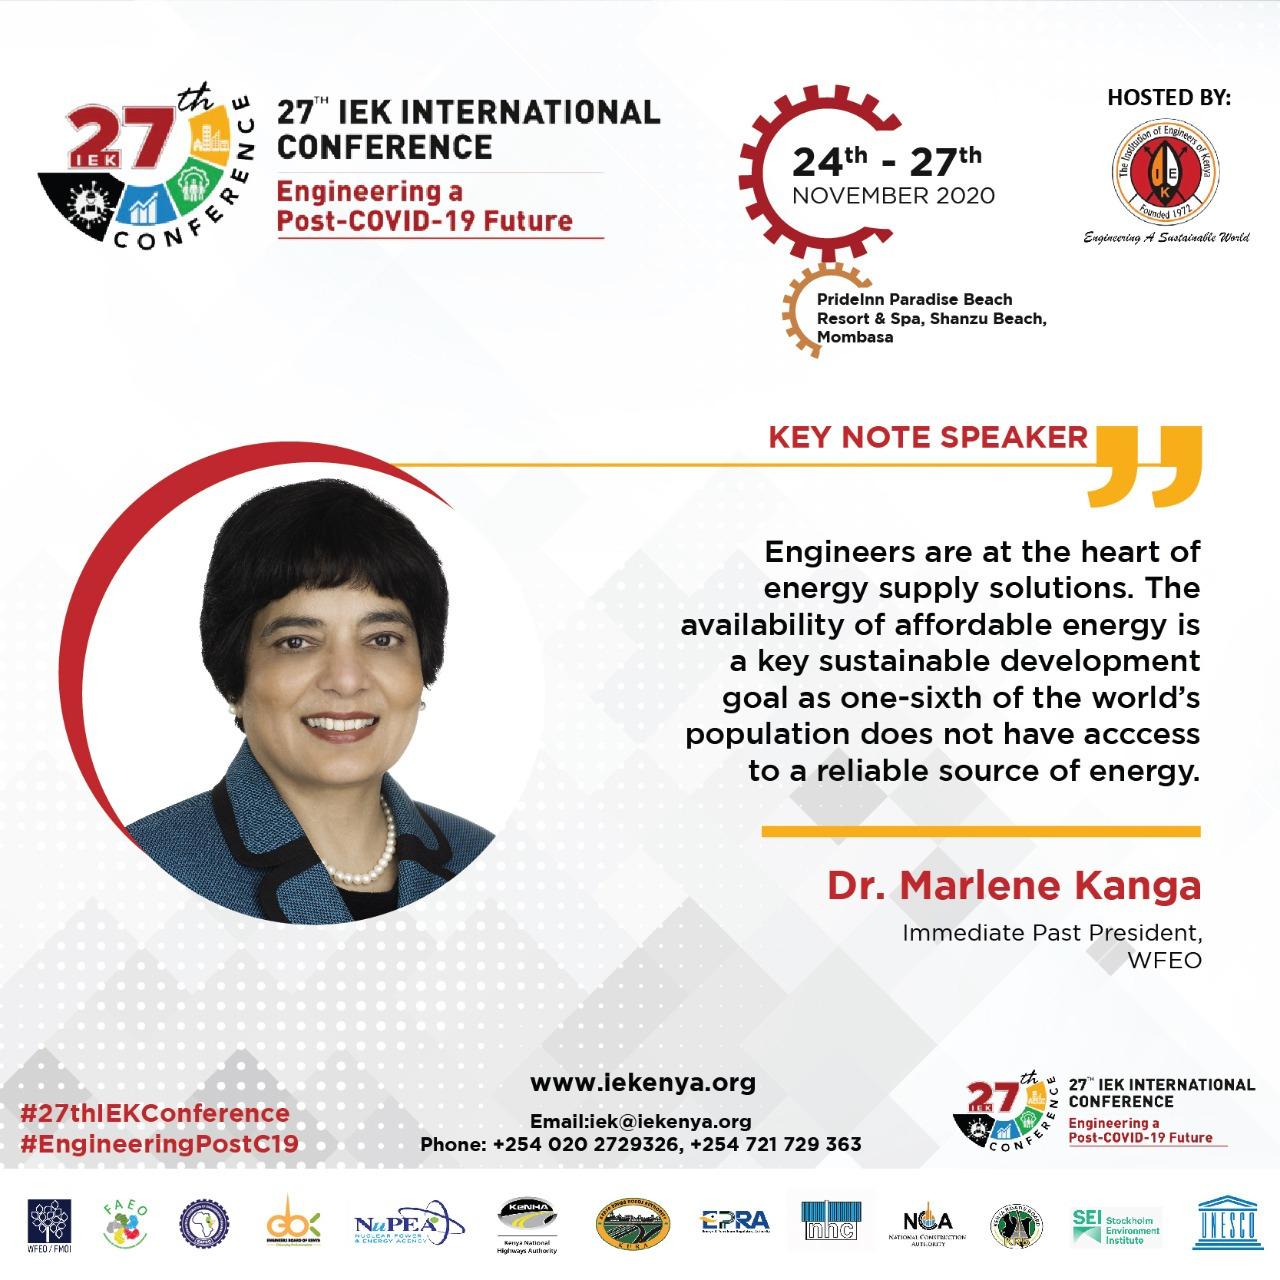 Social media image of the presentation by WFEO Immediate Past President Dr Marlene Kanga